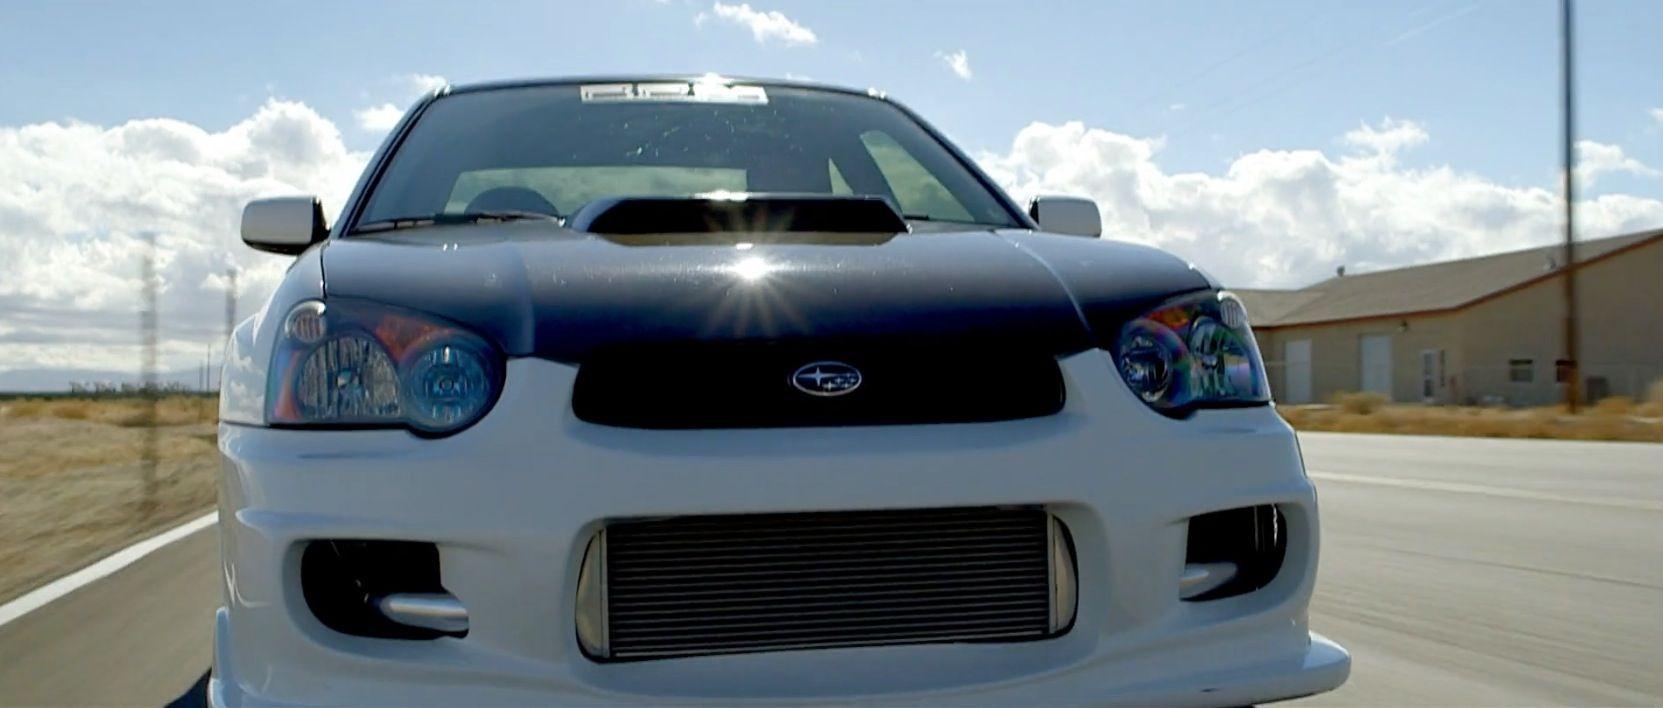 subaru impreza wrx sti (2005) car in born to race fast track (2014